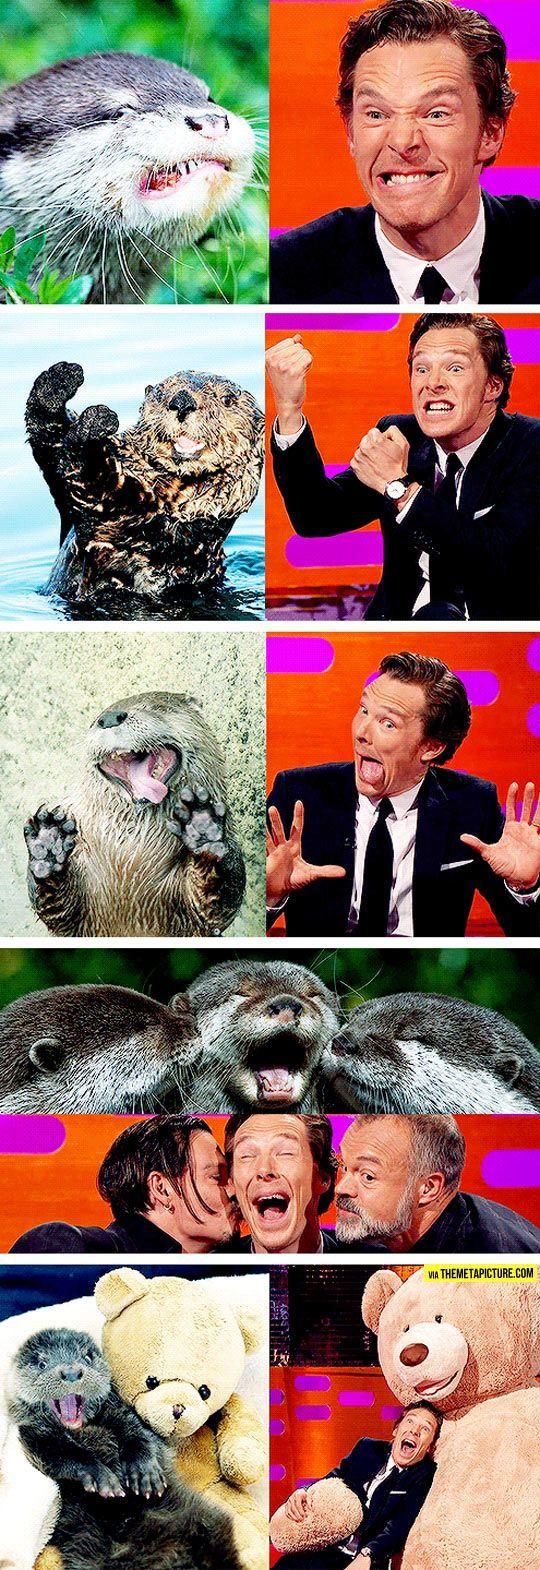 Benedict Cumberbatch Reenacts Otter Memes...omg I love it hahahaha